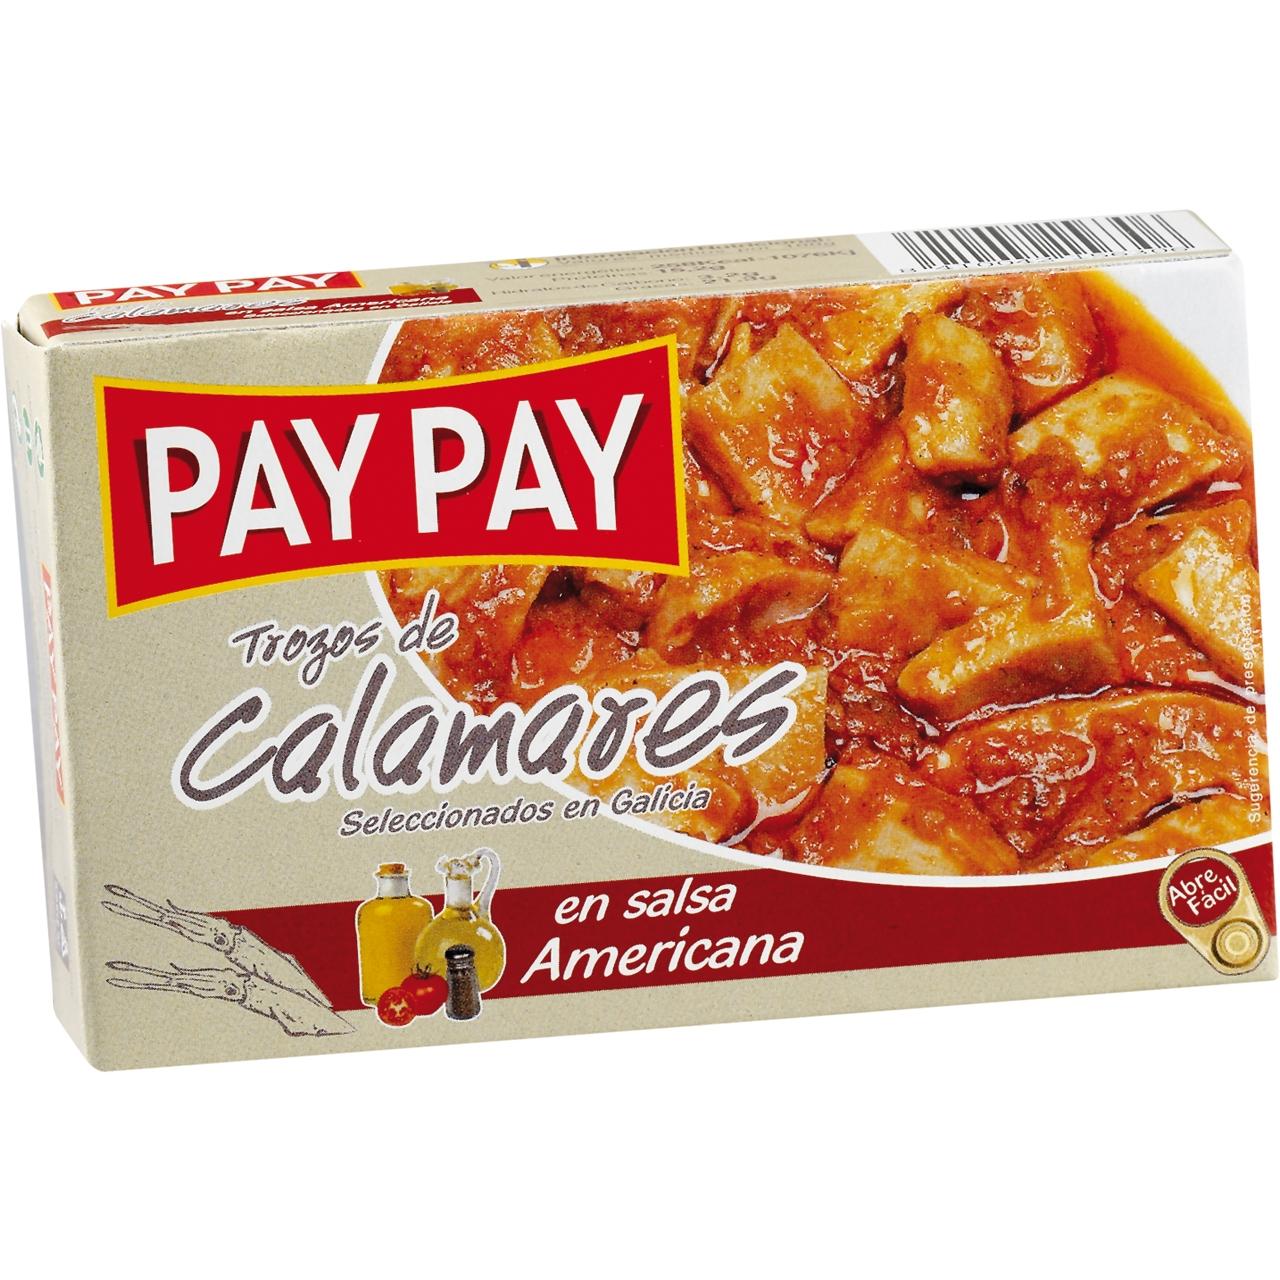 Calamars en salsa americana OL 120 F.O. Pay Pay